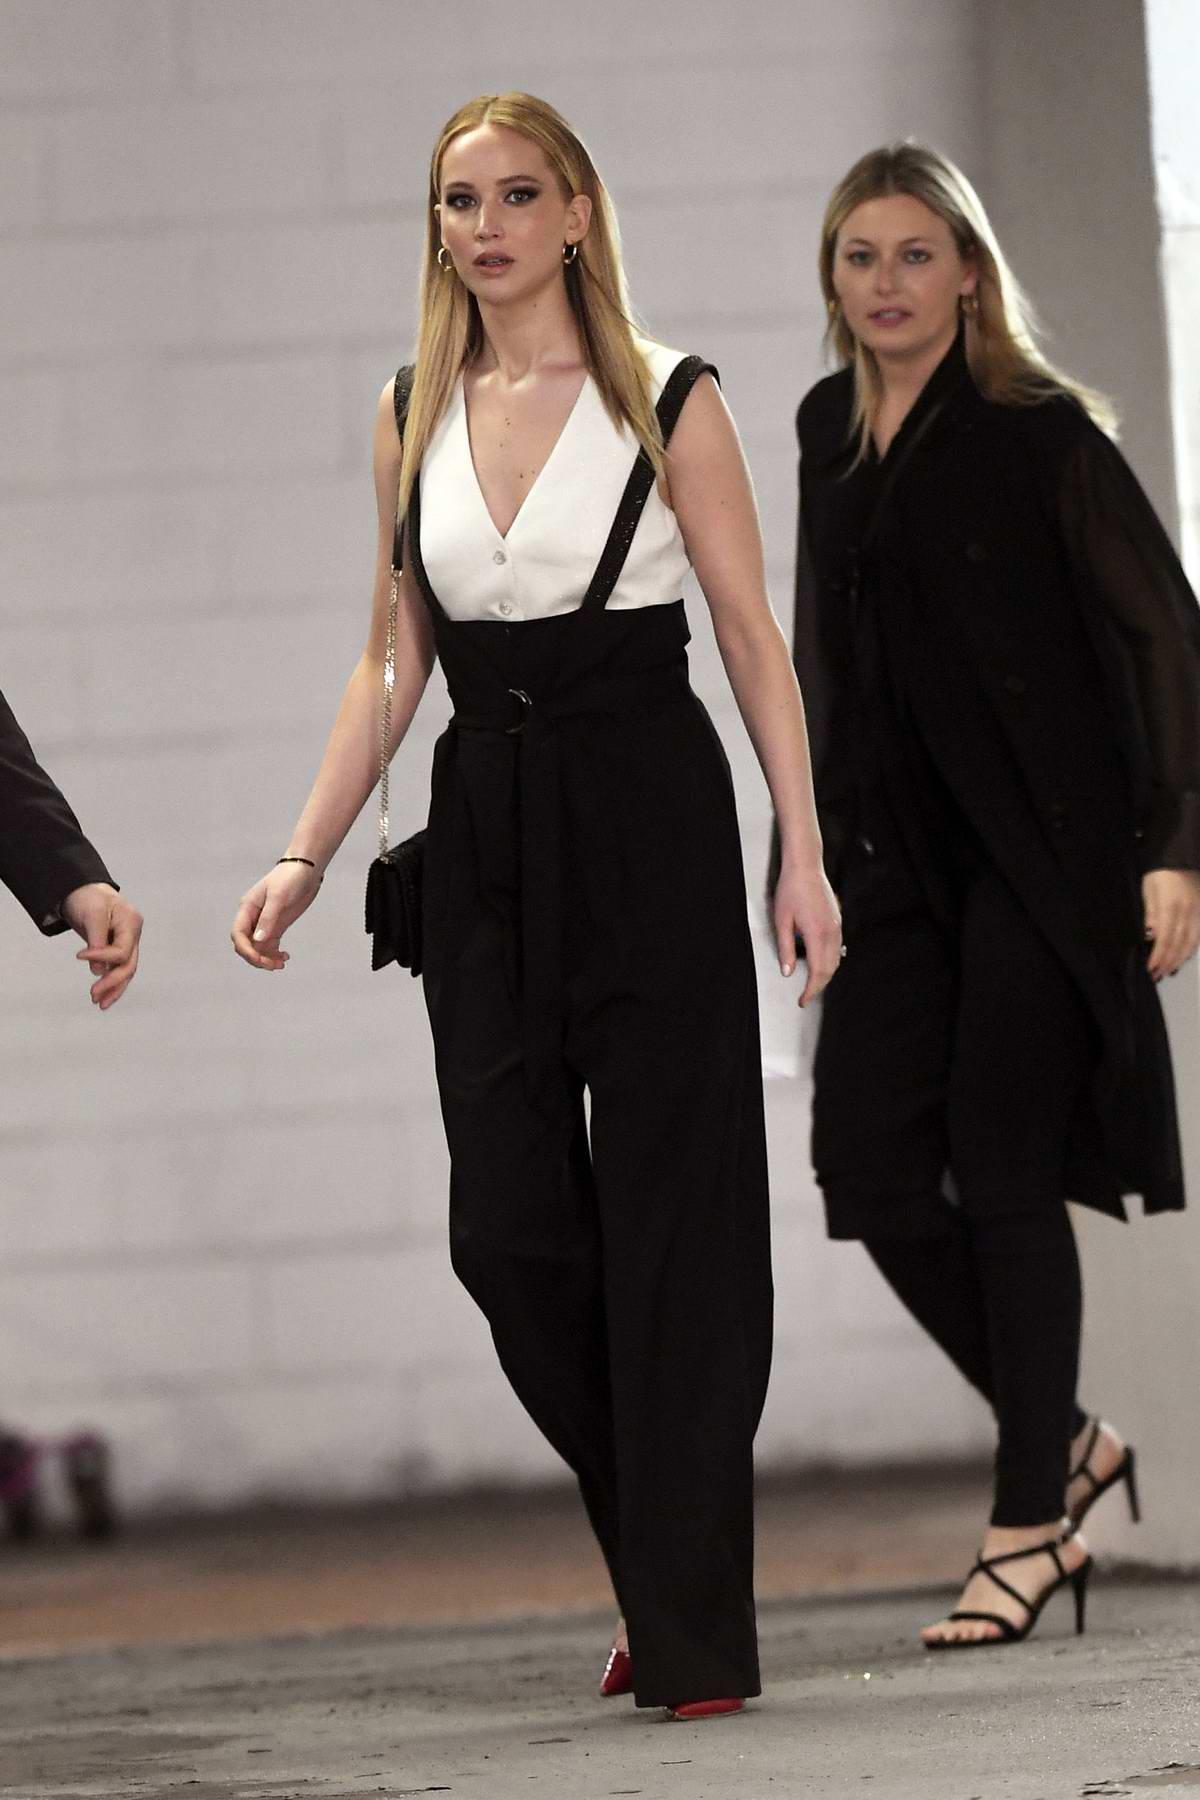 Jennifer Lawrence seen leaving the Tribeca Talks in New York City